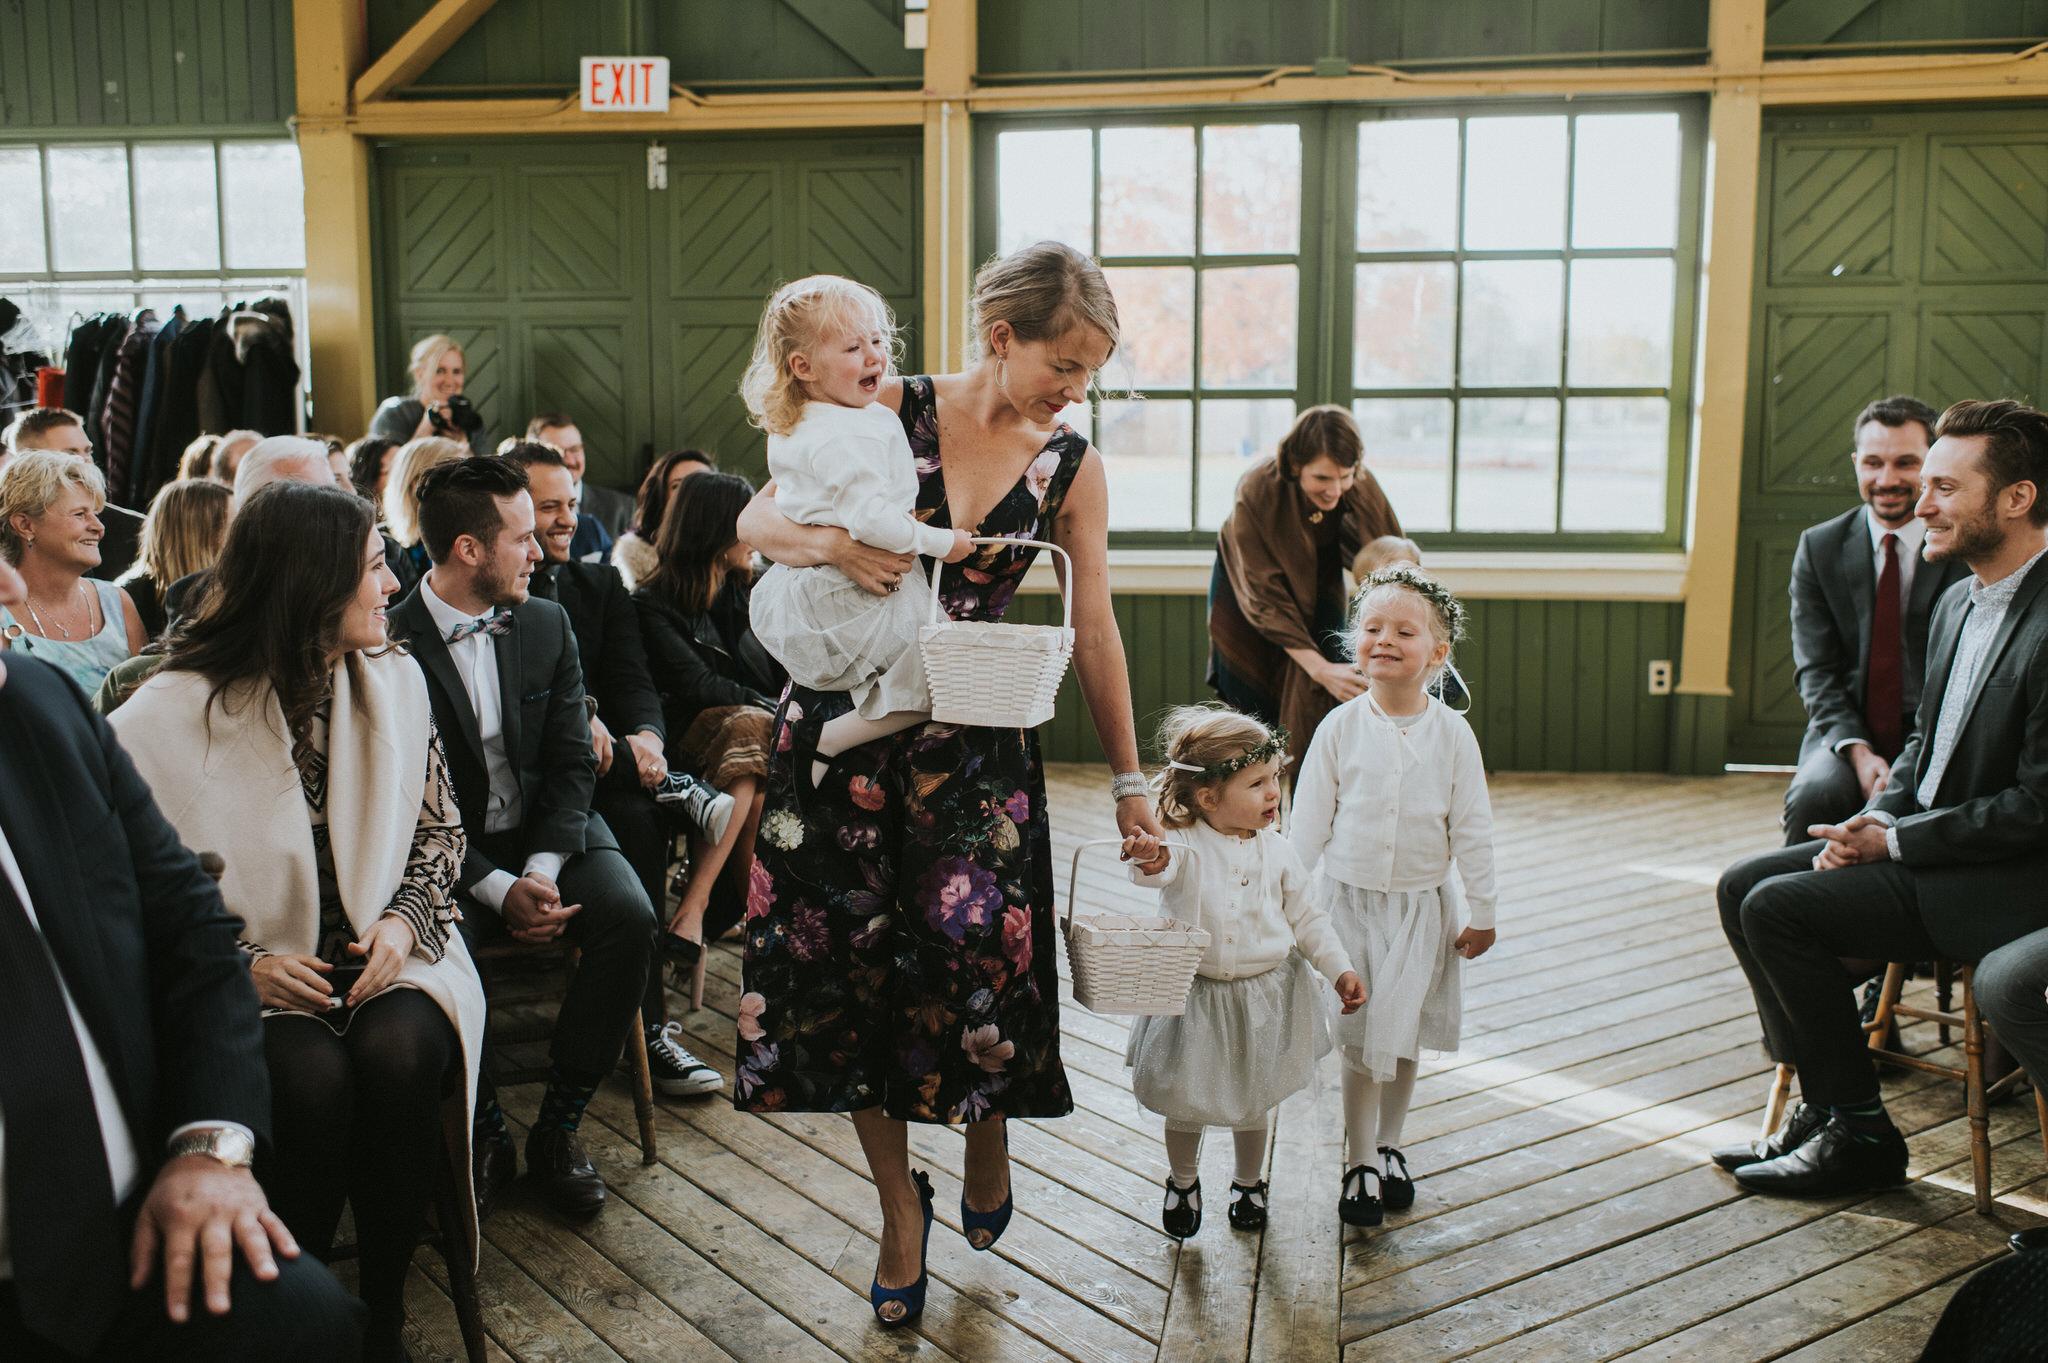 scarletoneillphotography_weddingphotography_prince edward county weddings109.JPG